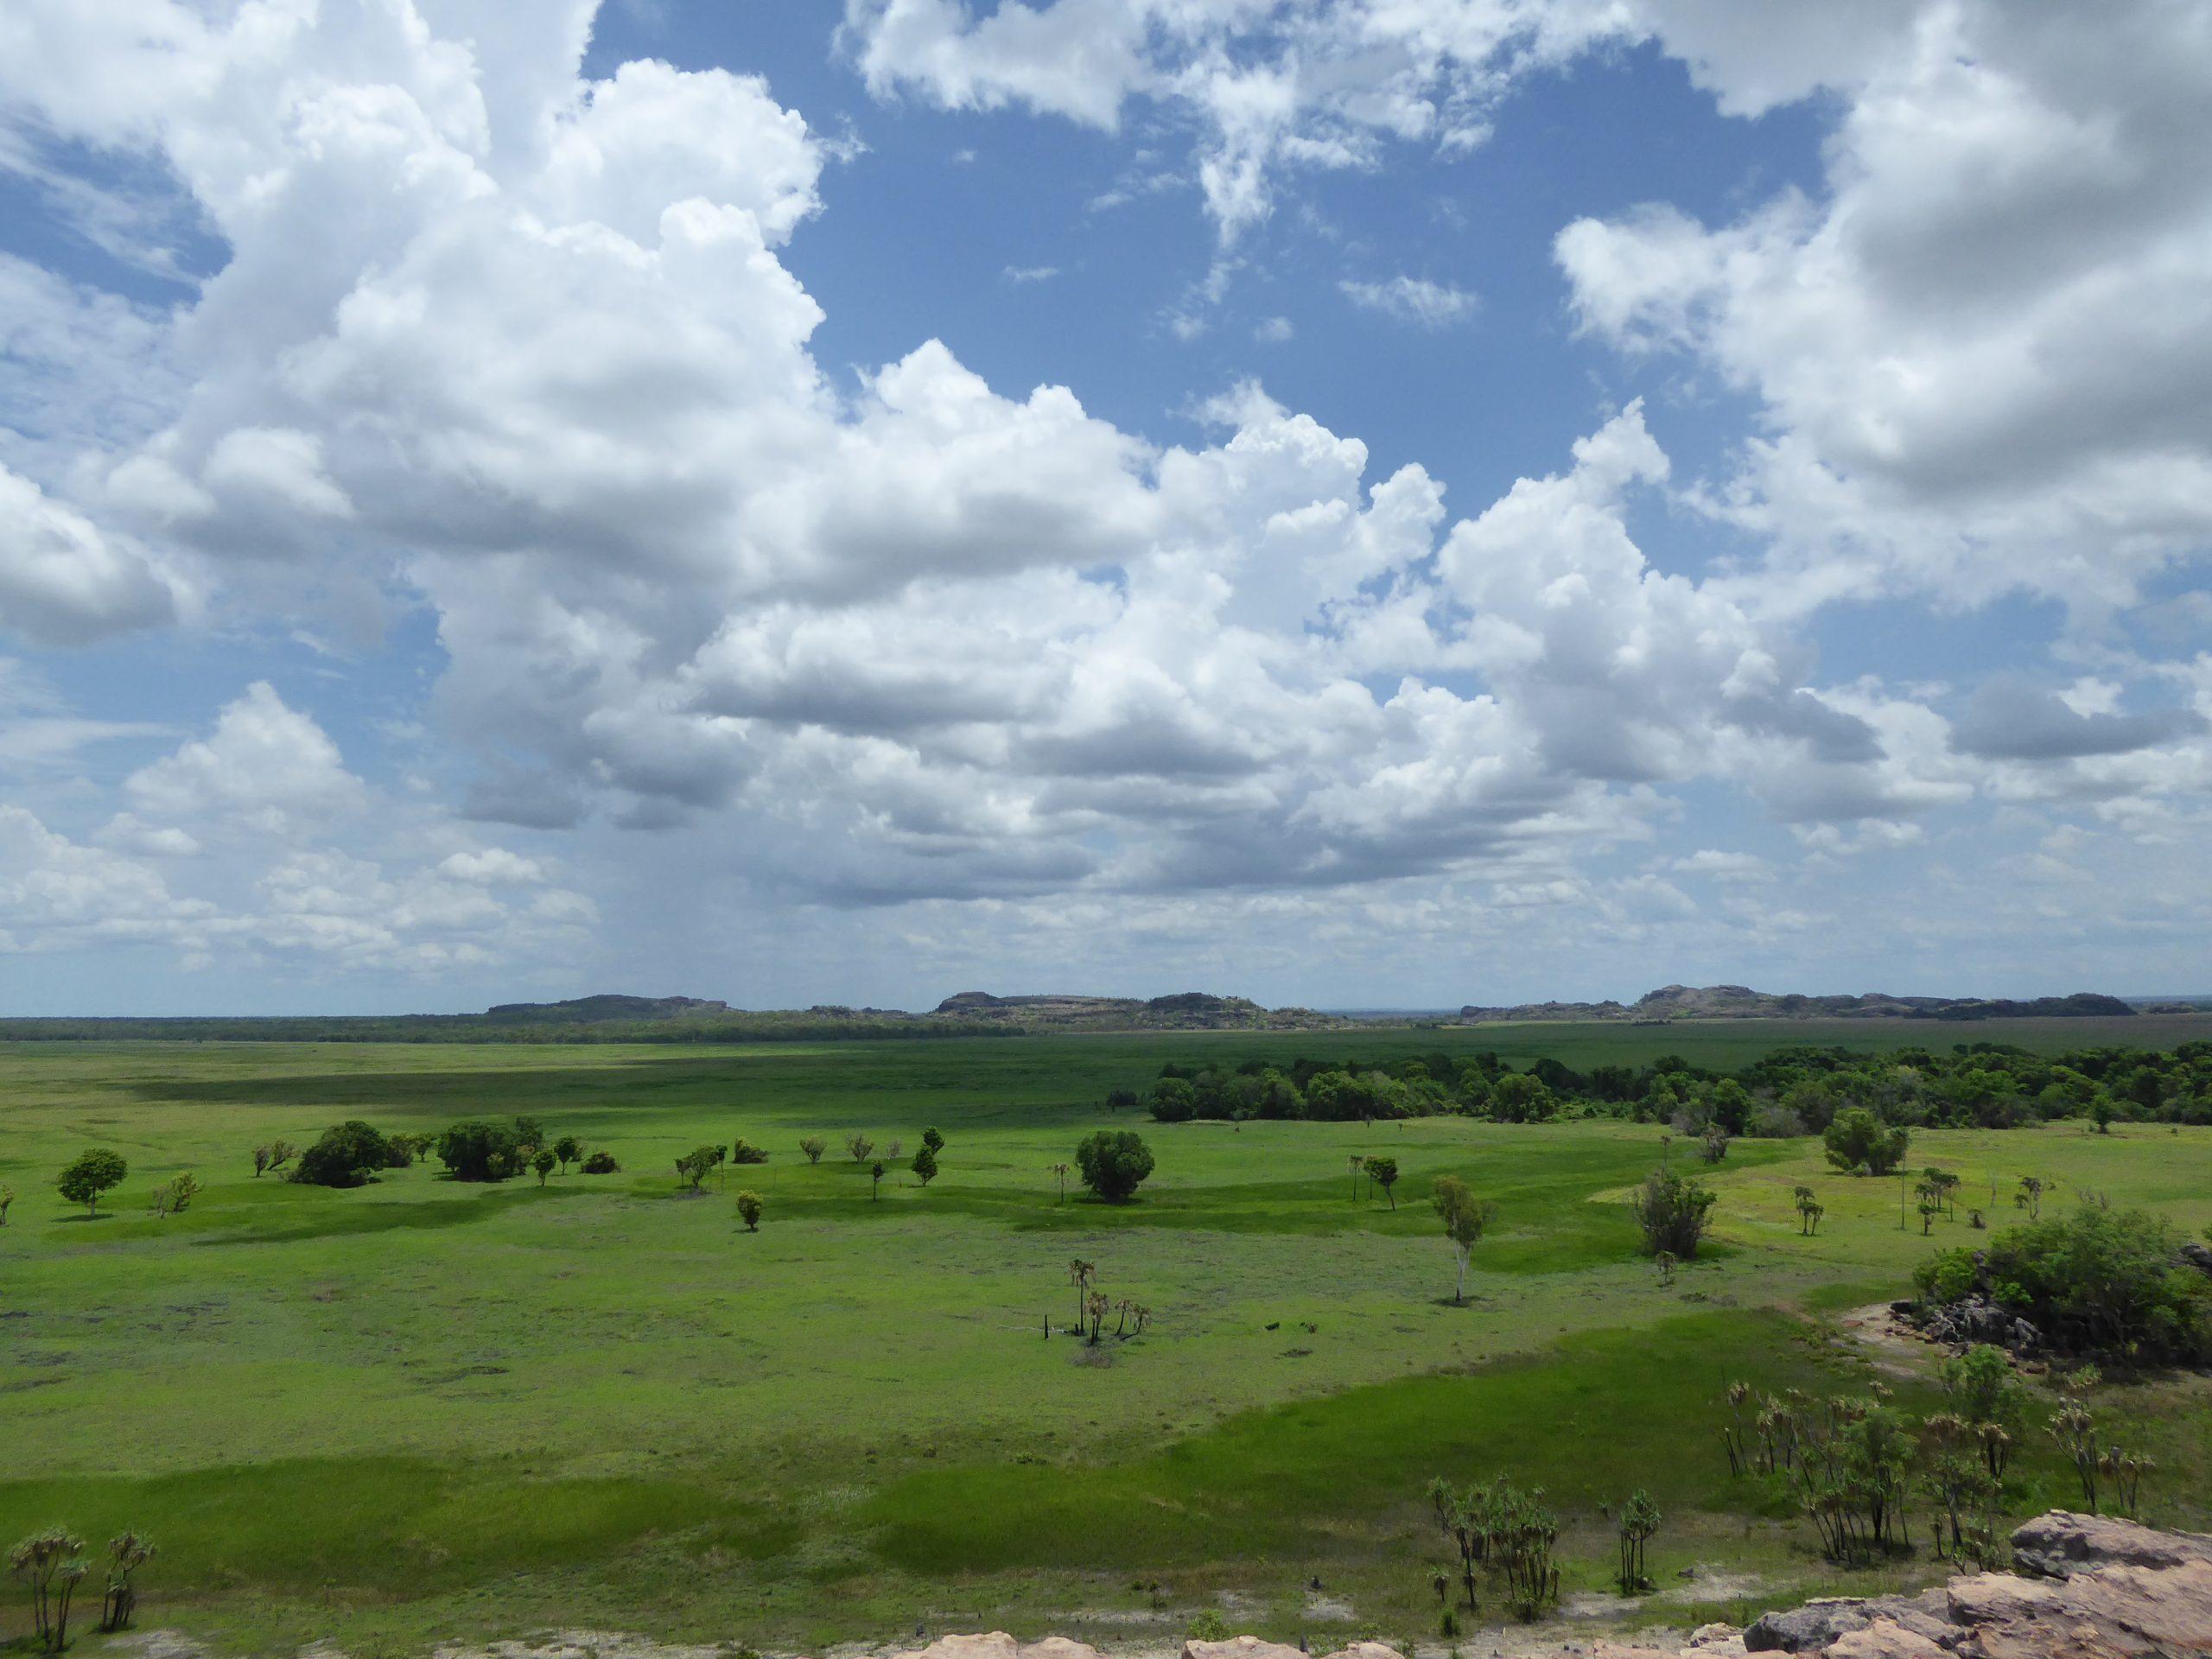 Radreise Australien 2016 - Kakadu NP - Nadab Floodplain